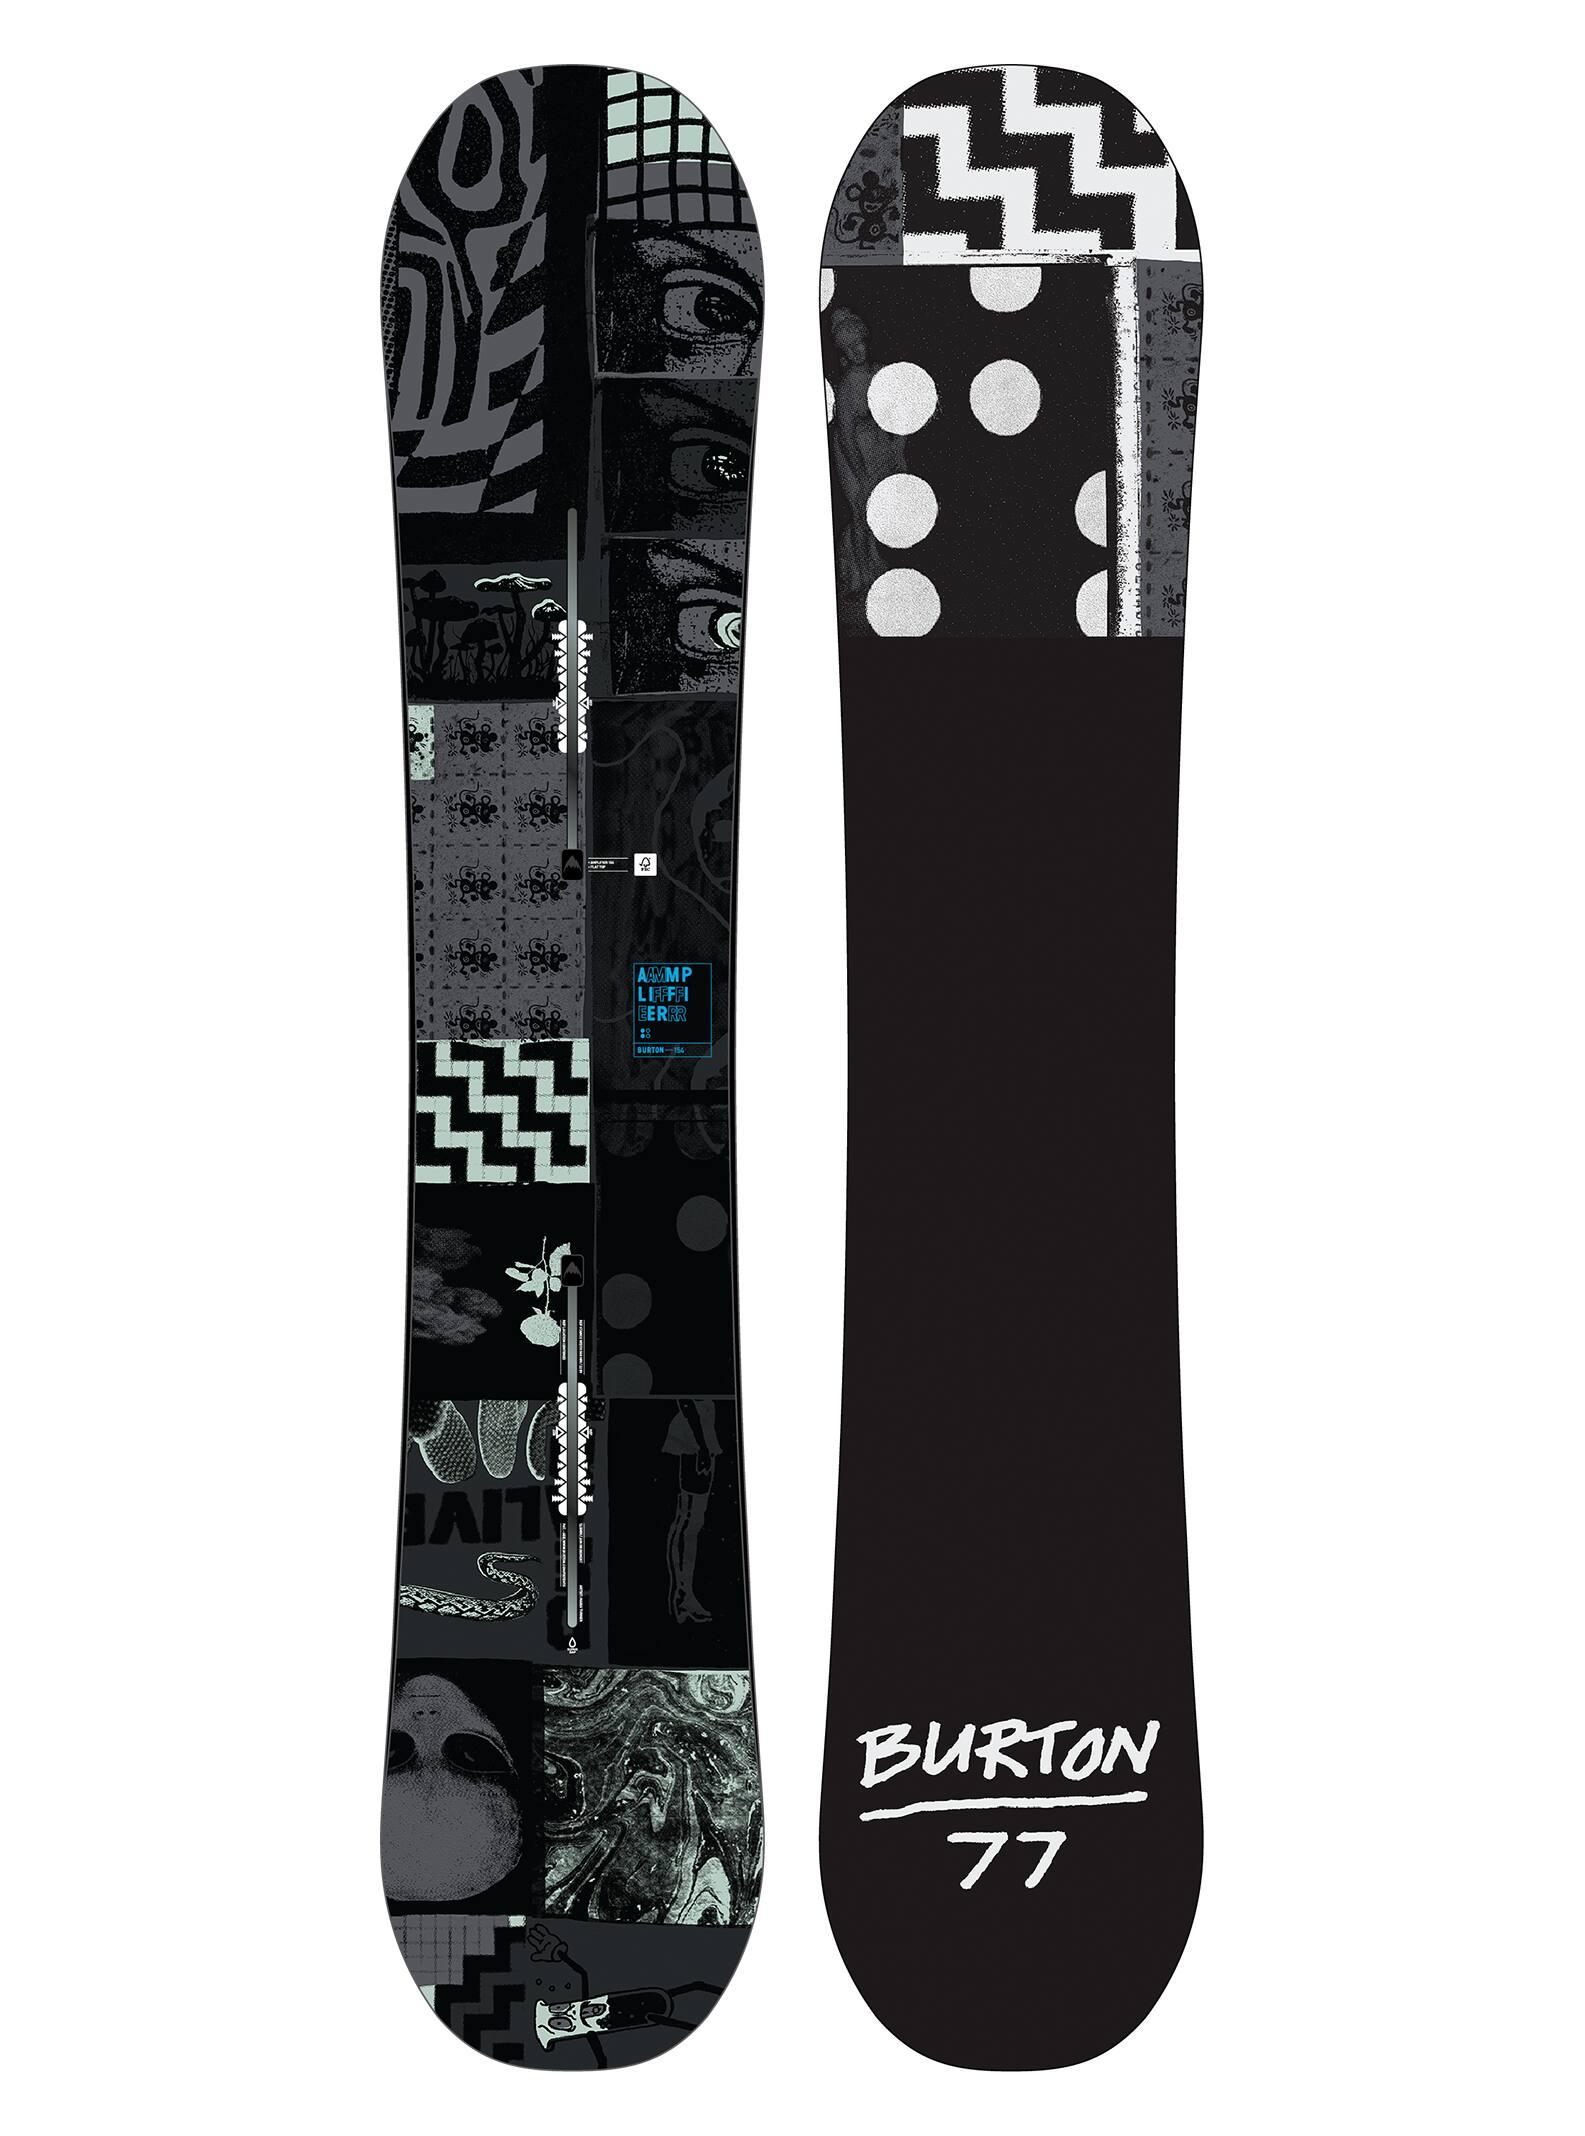 1c1a1b728 Men's Snowboards | Burton Snowboards